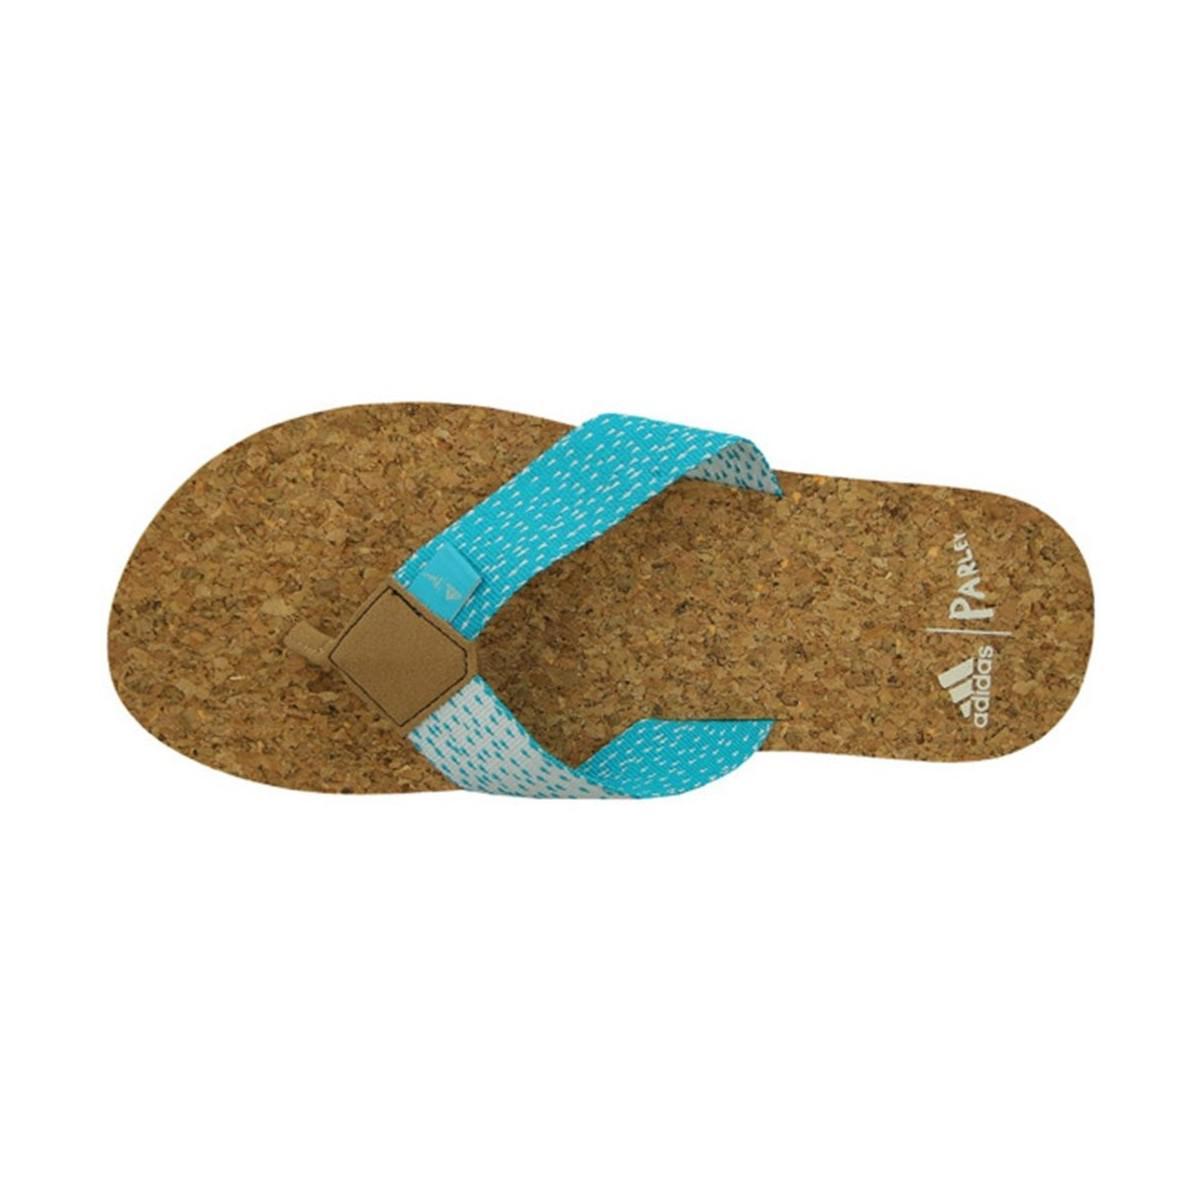 sneakers for cheap 328b2 404b1 Adidas Originals Eezay Parley Thong Mens Flip Flops  Sandals